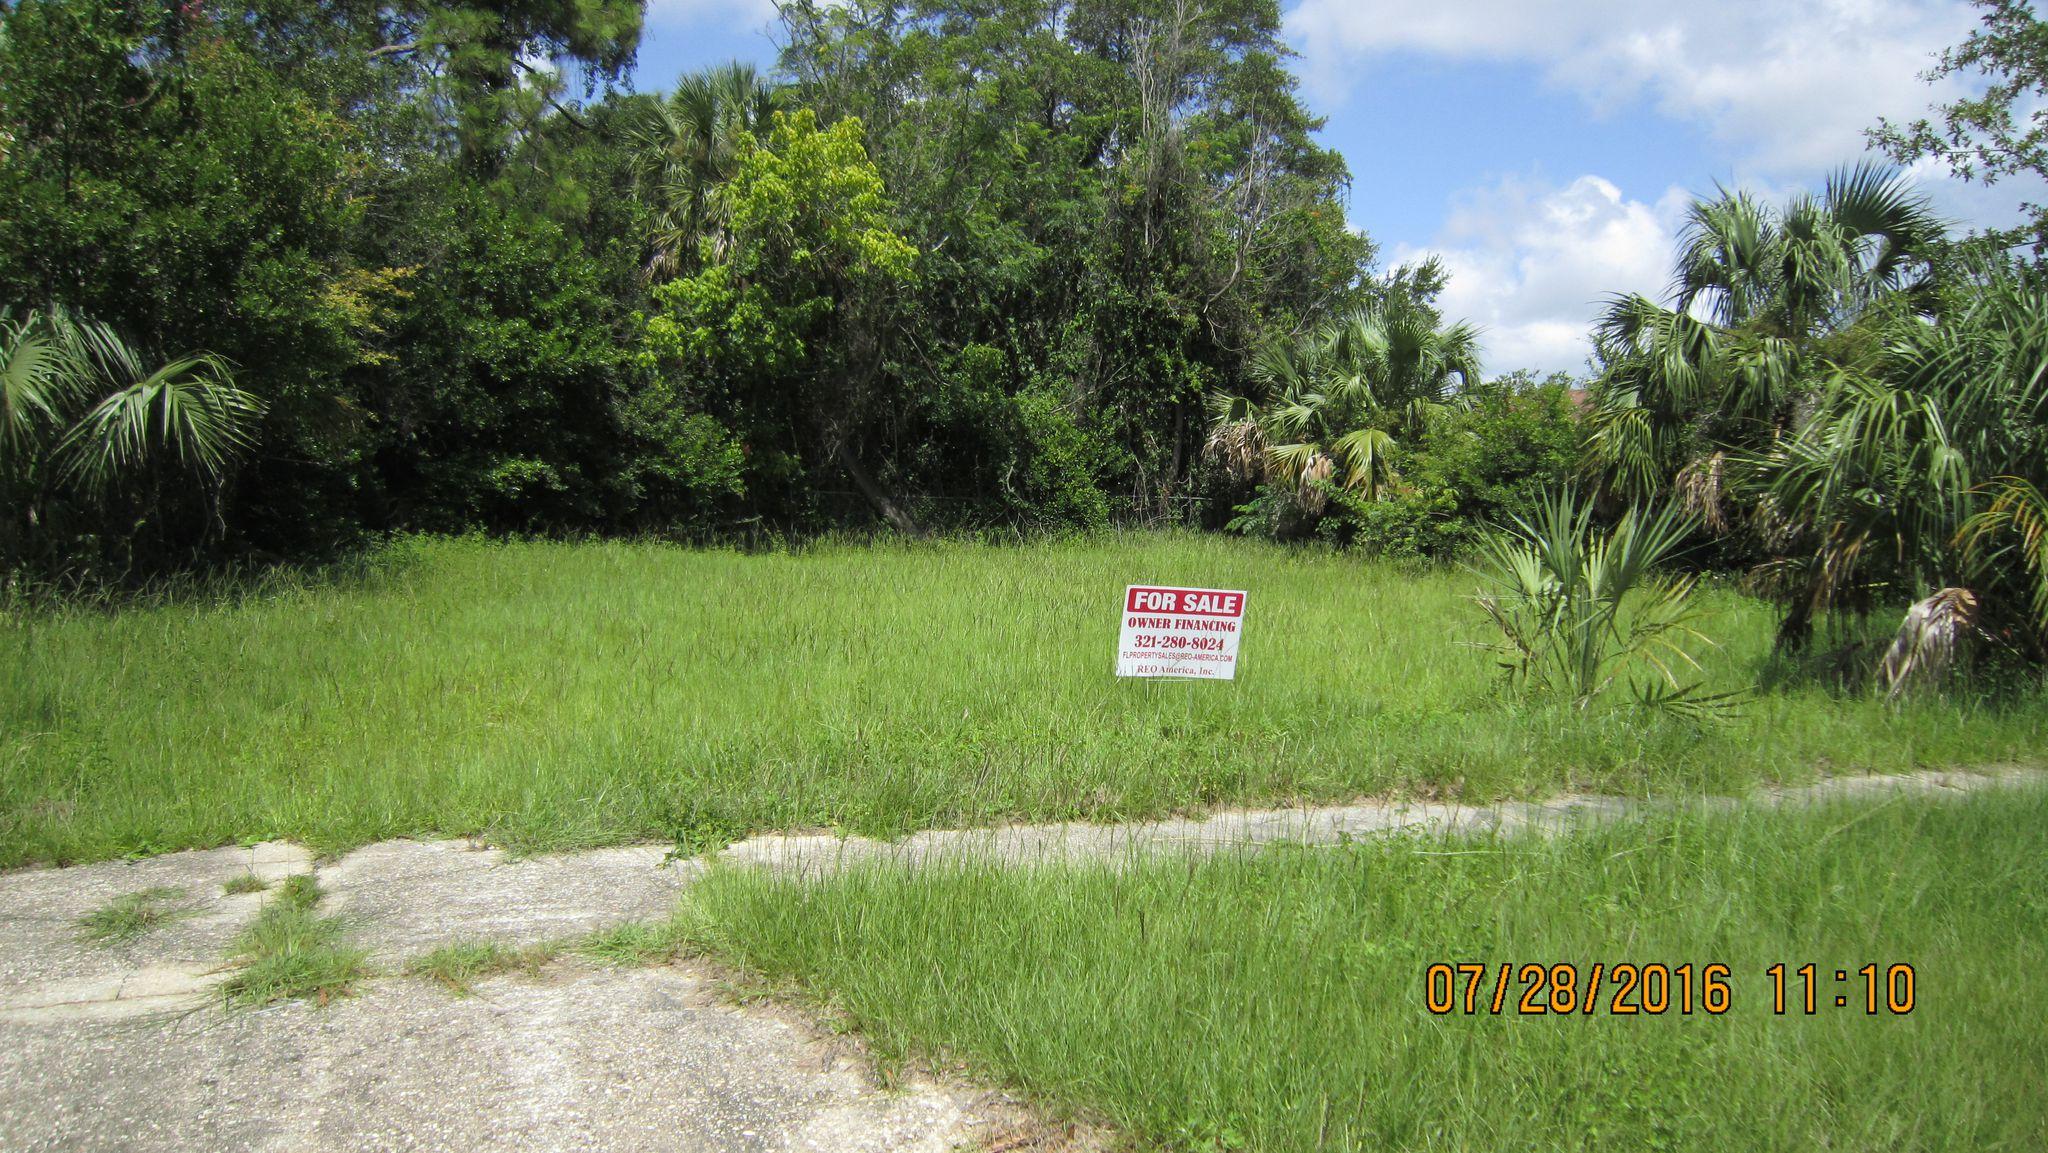 717 N L St, Pensacola, FL 32501 - Lot/Land | Trulia